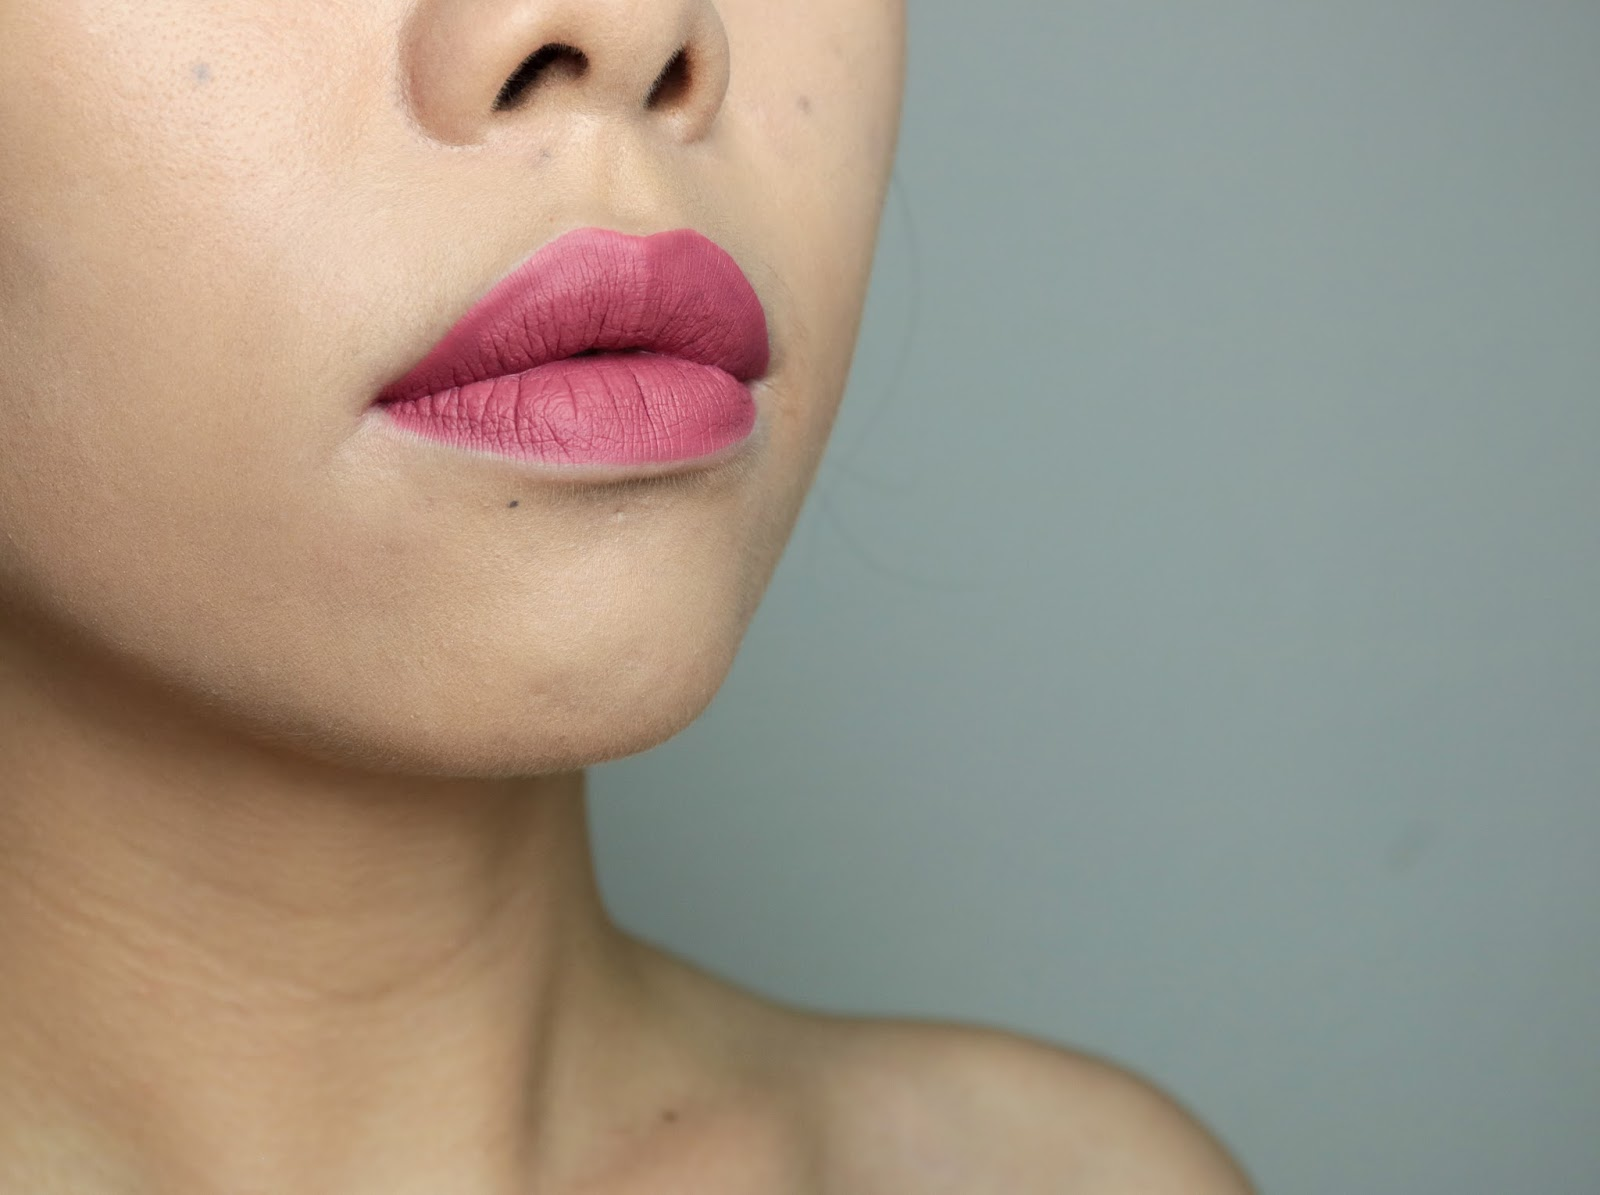 Les Velour Liquid Lipsticks de Jeffree Star Rose Matter swatch